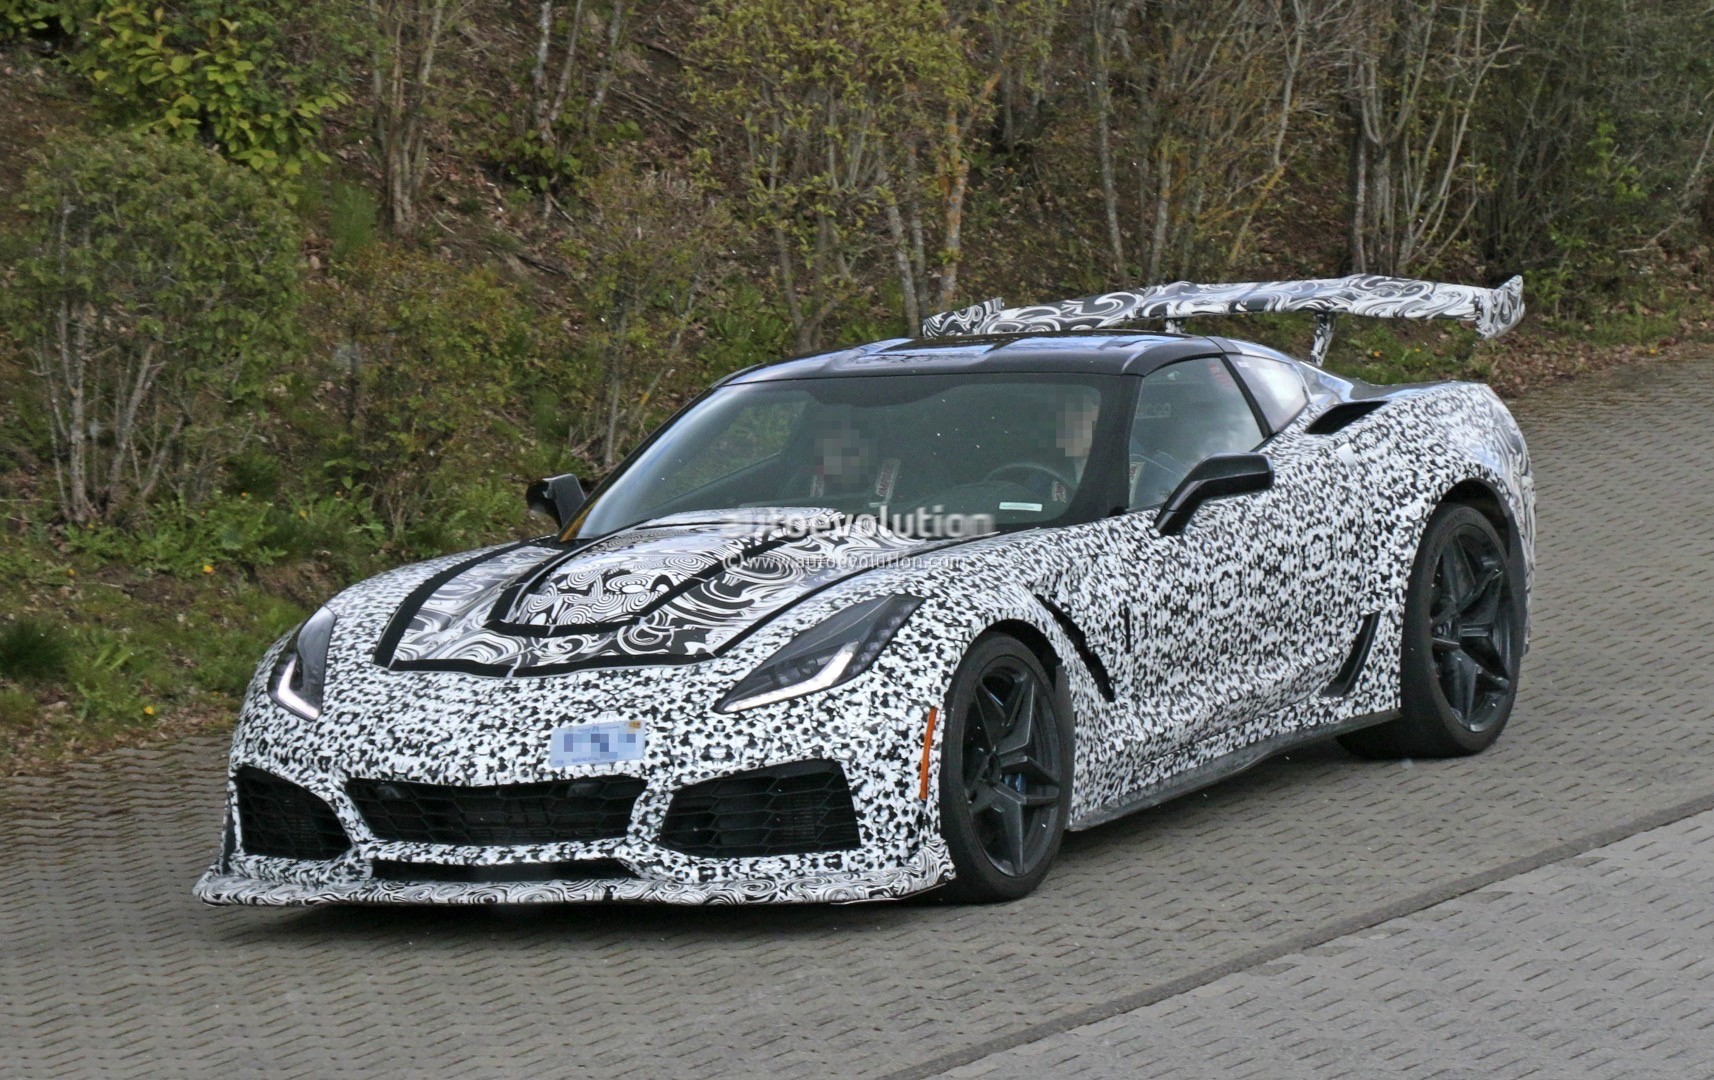 2018 Corvette Zr1 Confirmed With Supercharged Lt5 V8